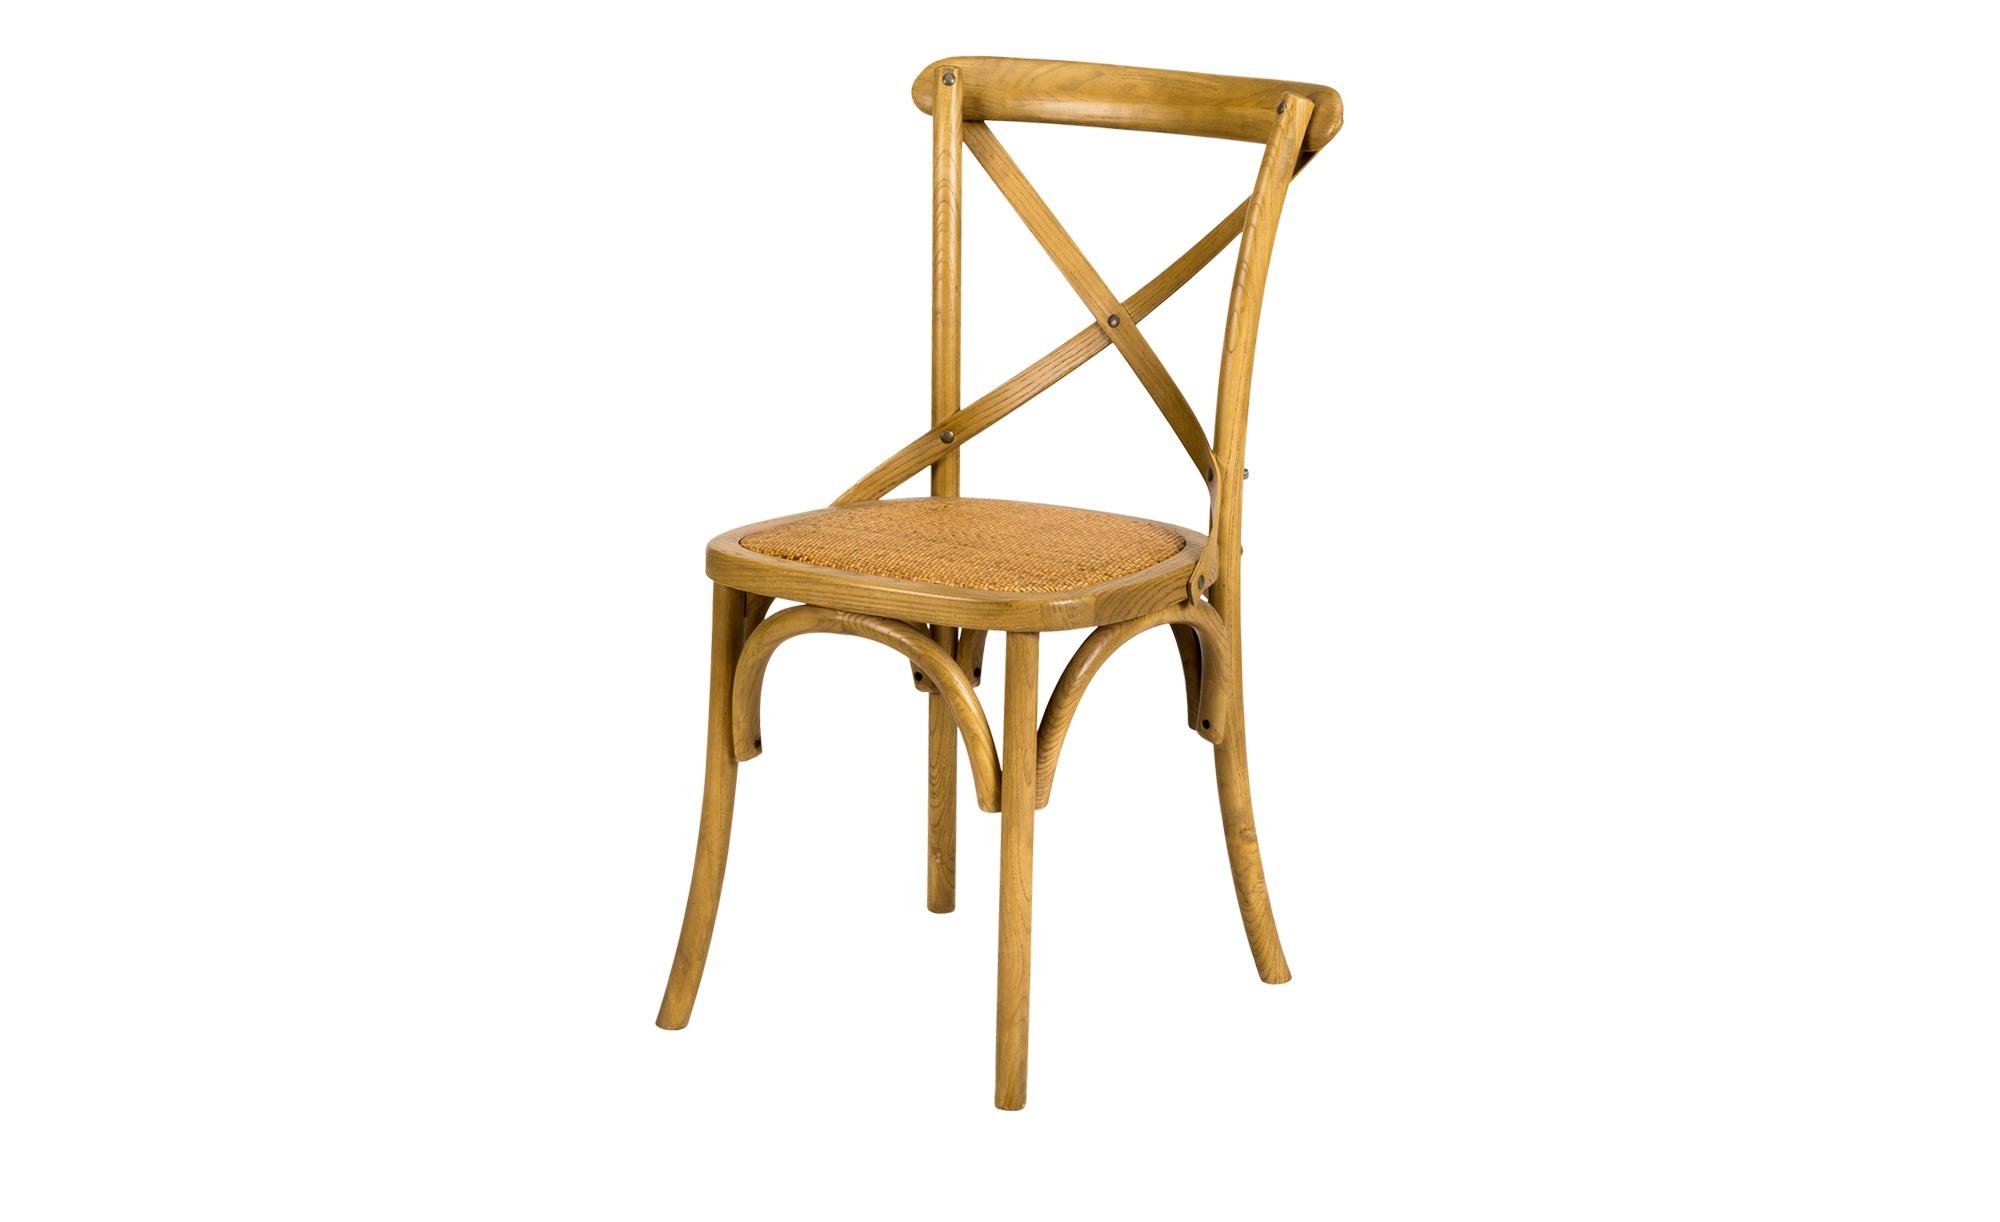 Holz Stuhl Mit Rattan Sitzflache Natur Mobel Kraft